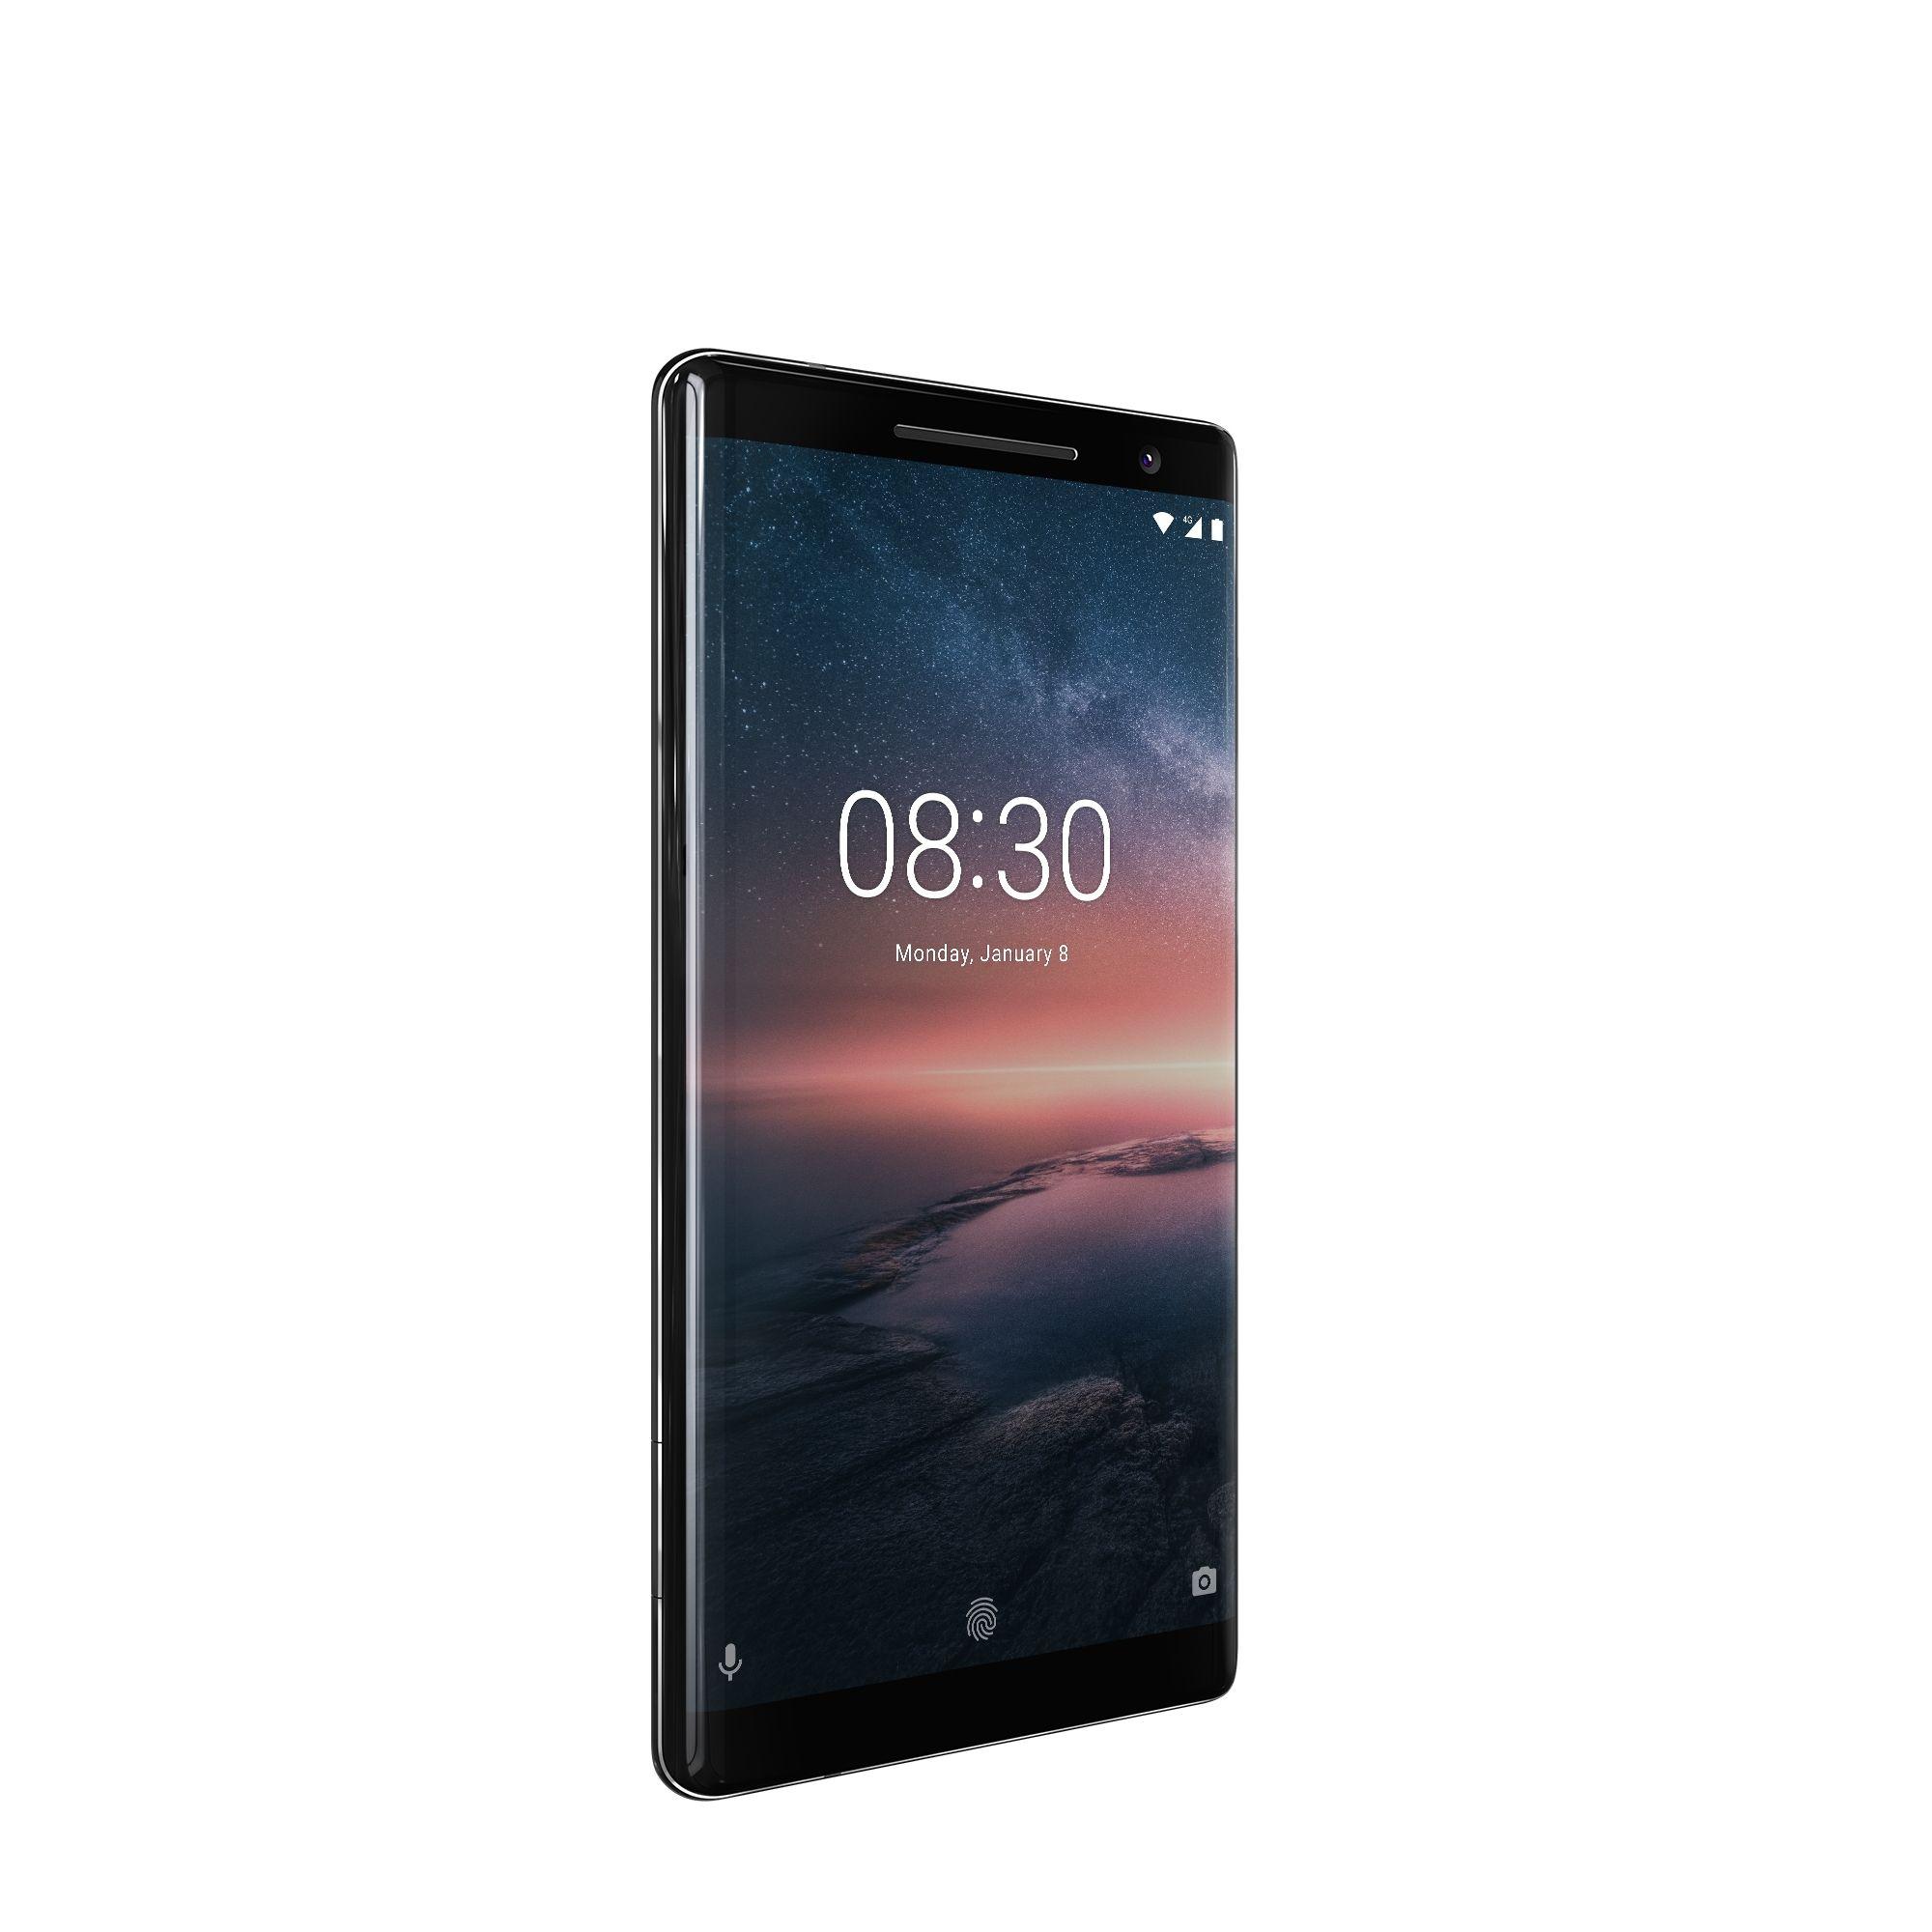 Nokia 8 Sirocco er den definitive toppmodellen i utvalget.